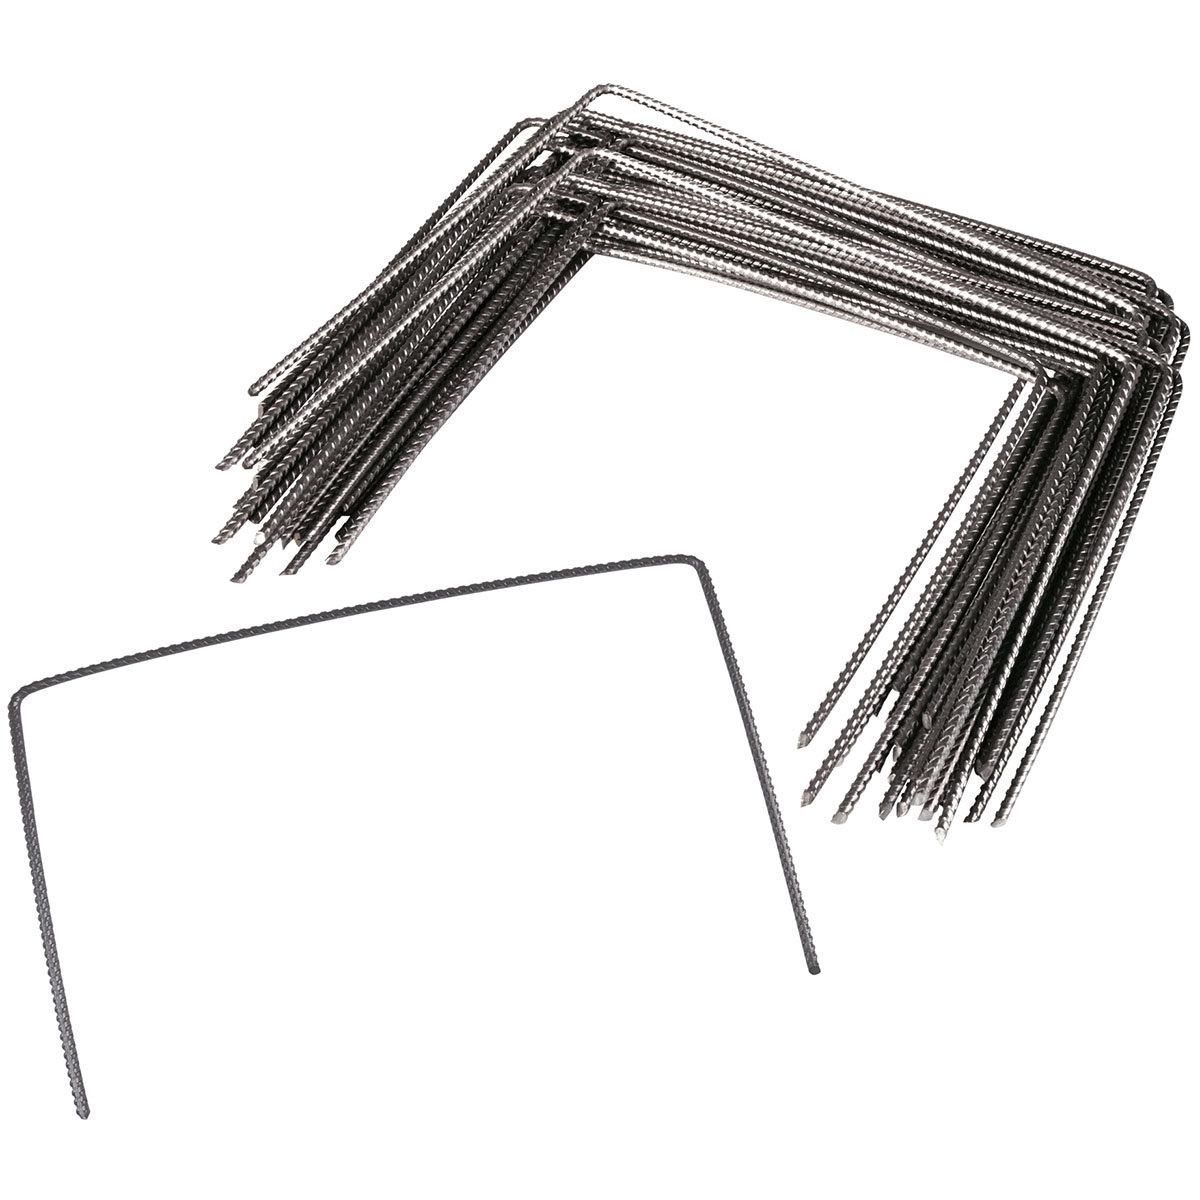 Metall-Hering, gerippt, 20 x 25 cm, 100 Stück   #2